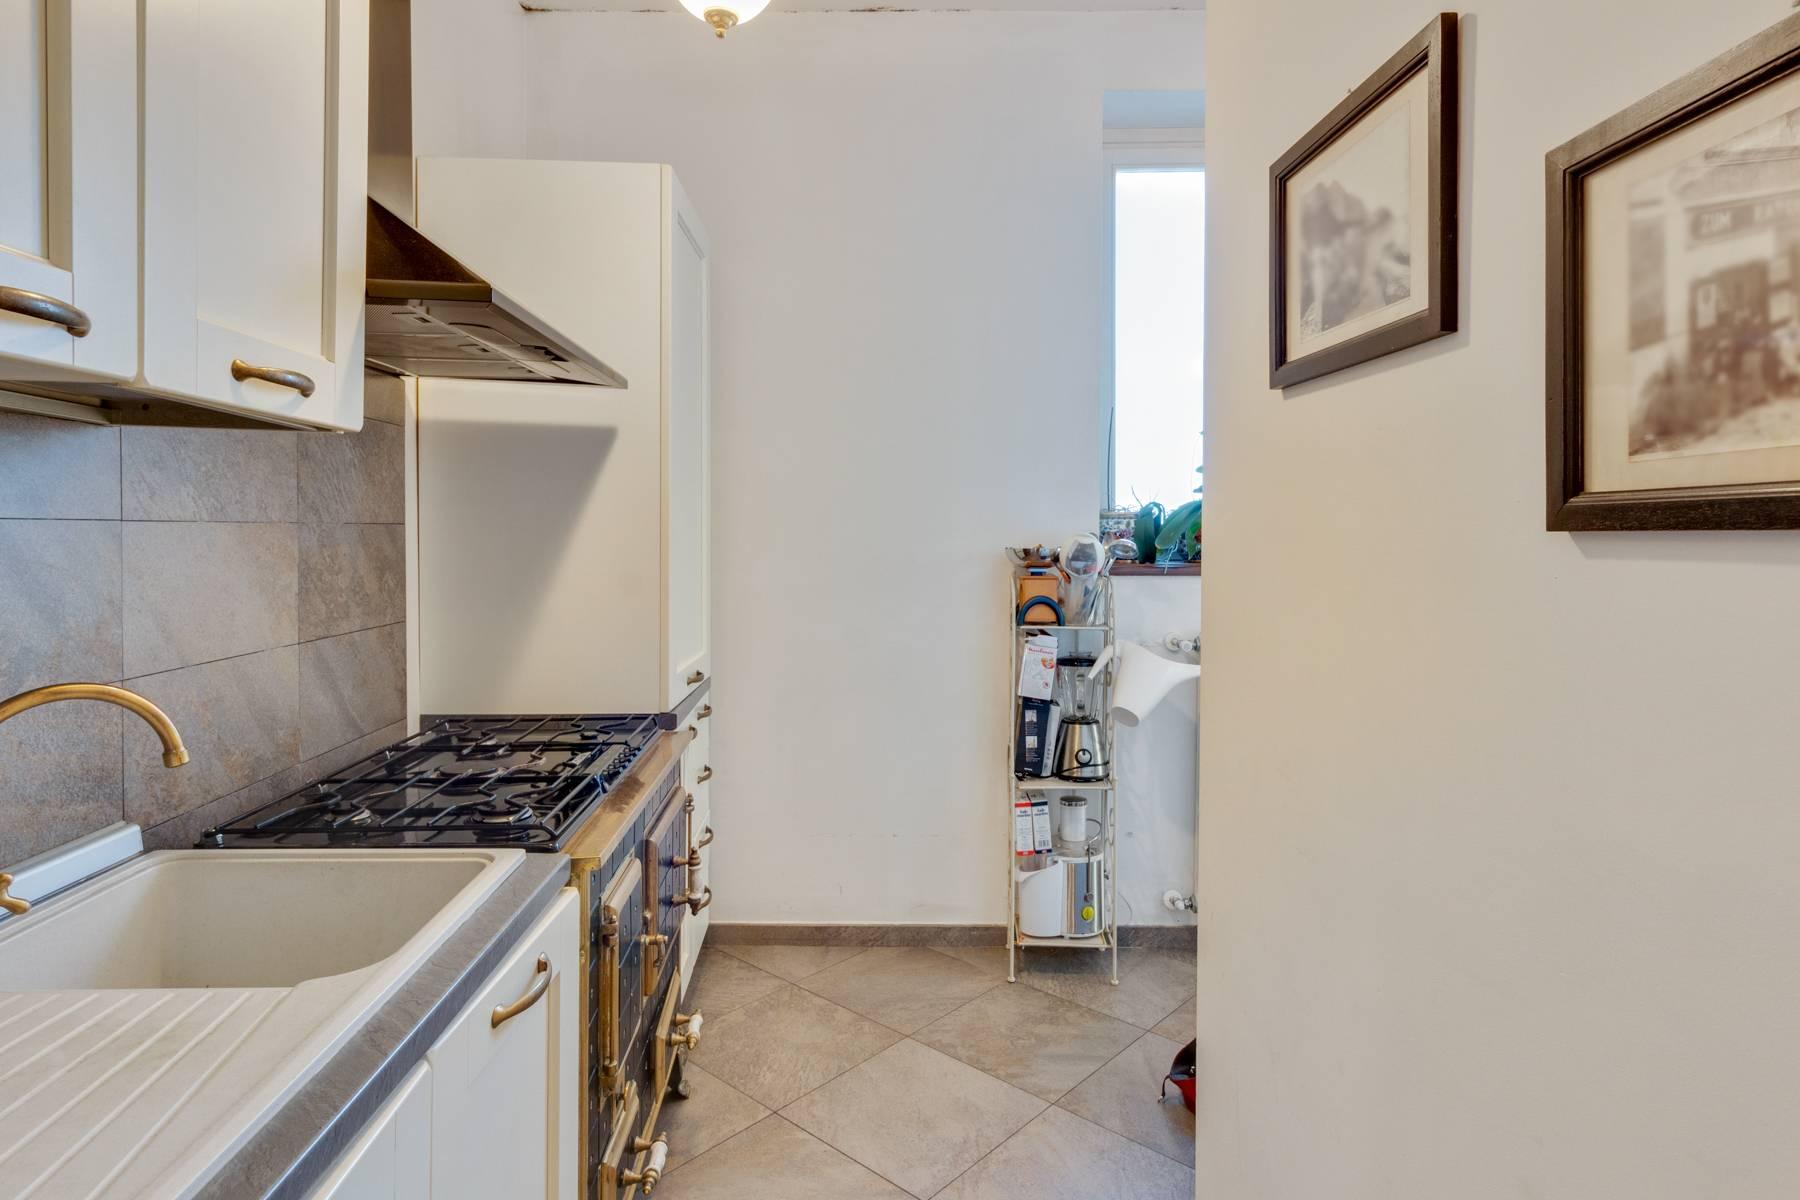 Casa indipendente in Vendita a Torino: 5 locali, 270 mq - Foto 14